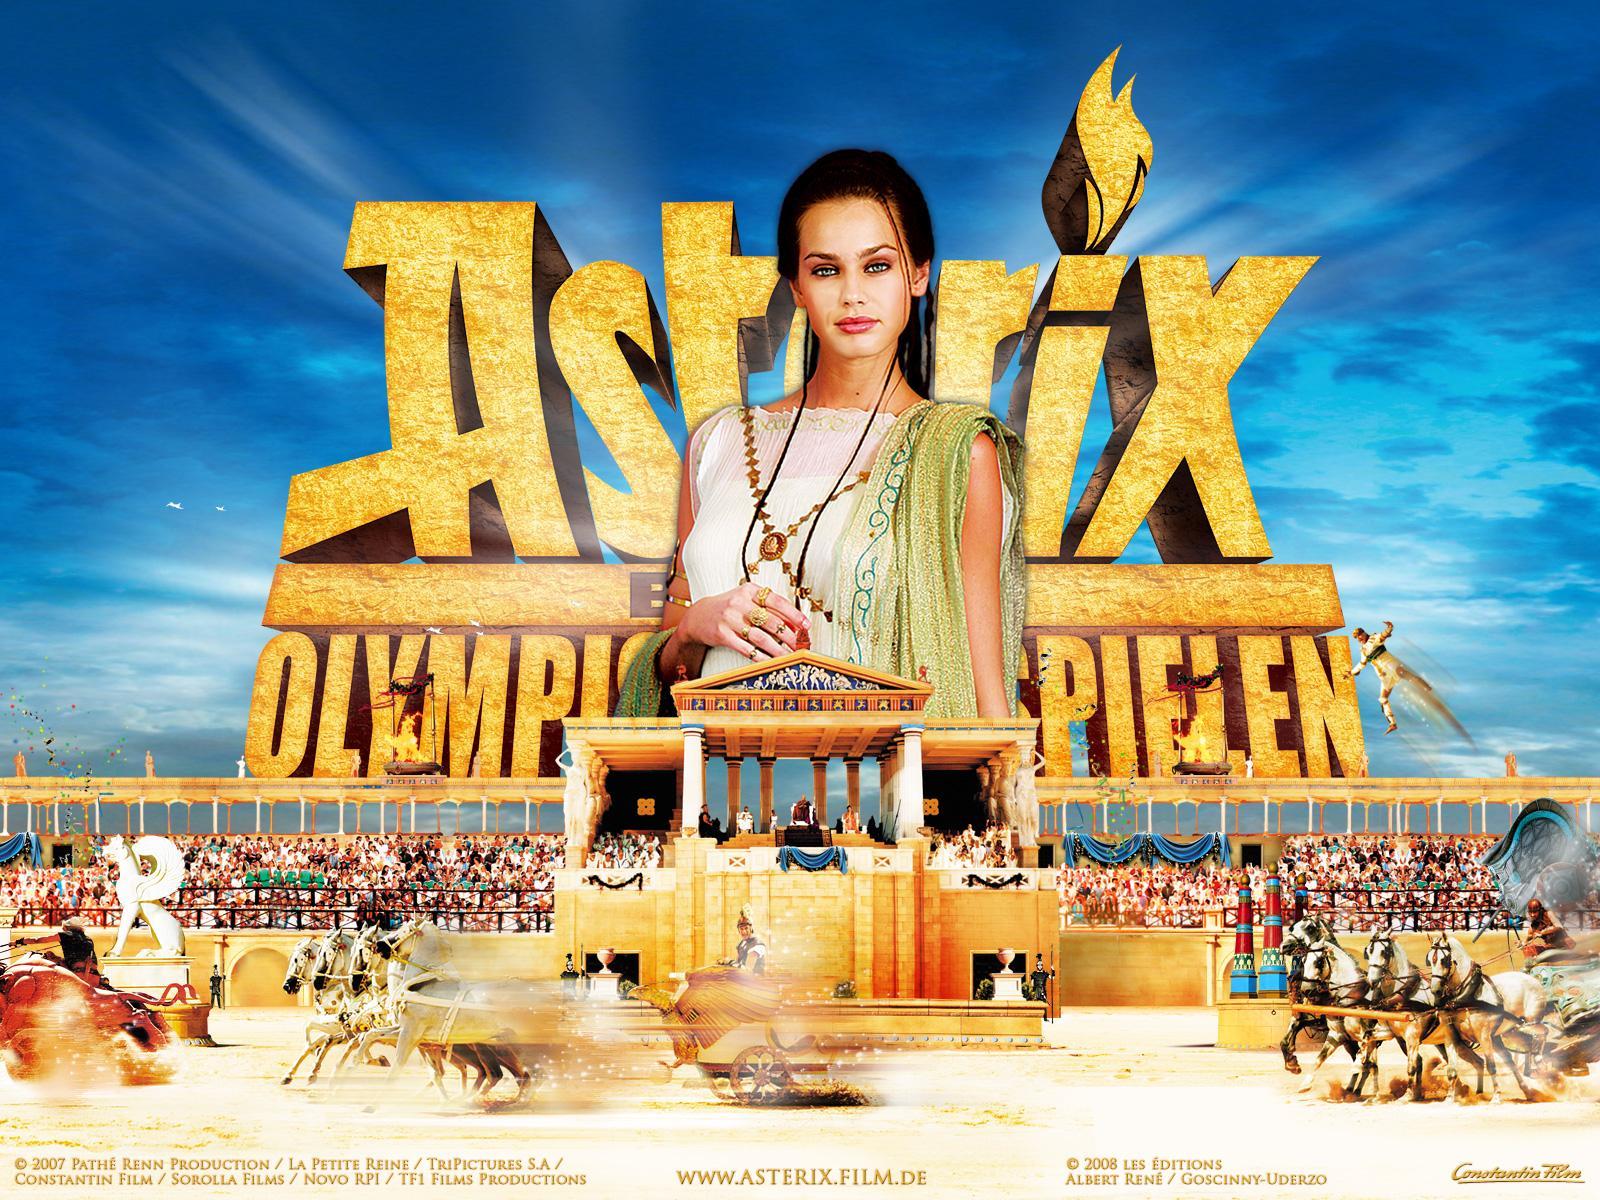 Asterix at the olympic games เปิดเกมส์โอลิมปิกสะท้านโลก 2008